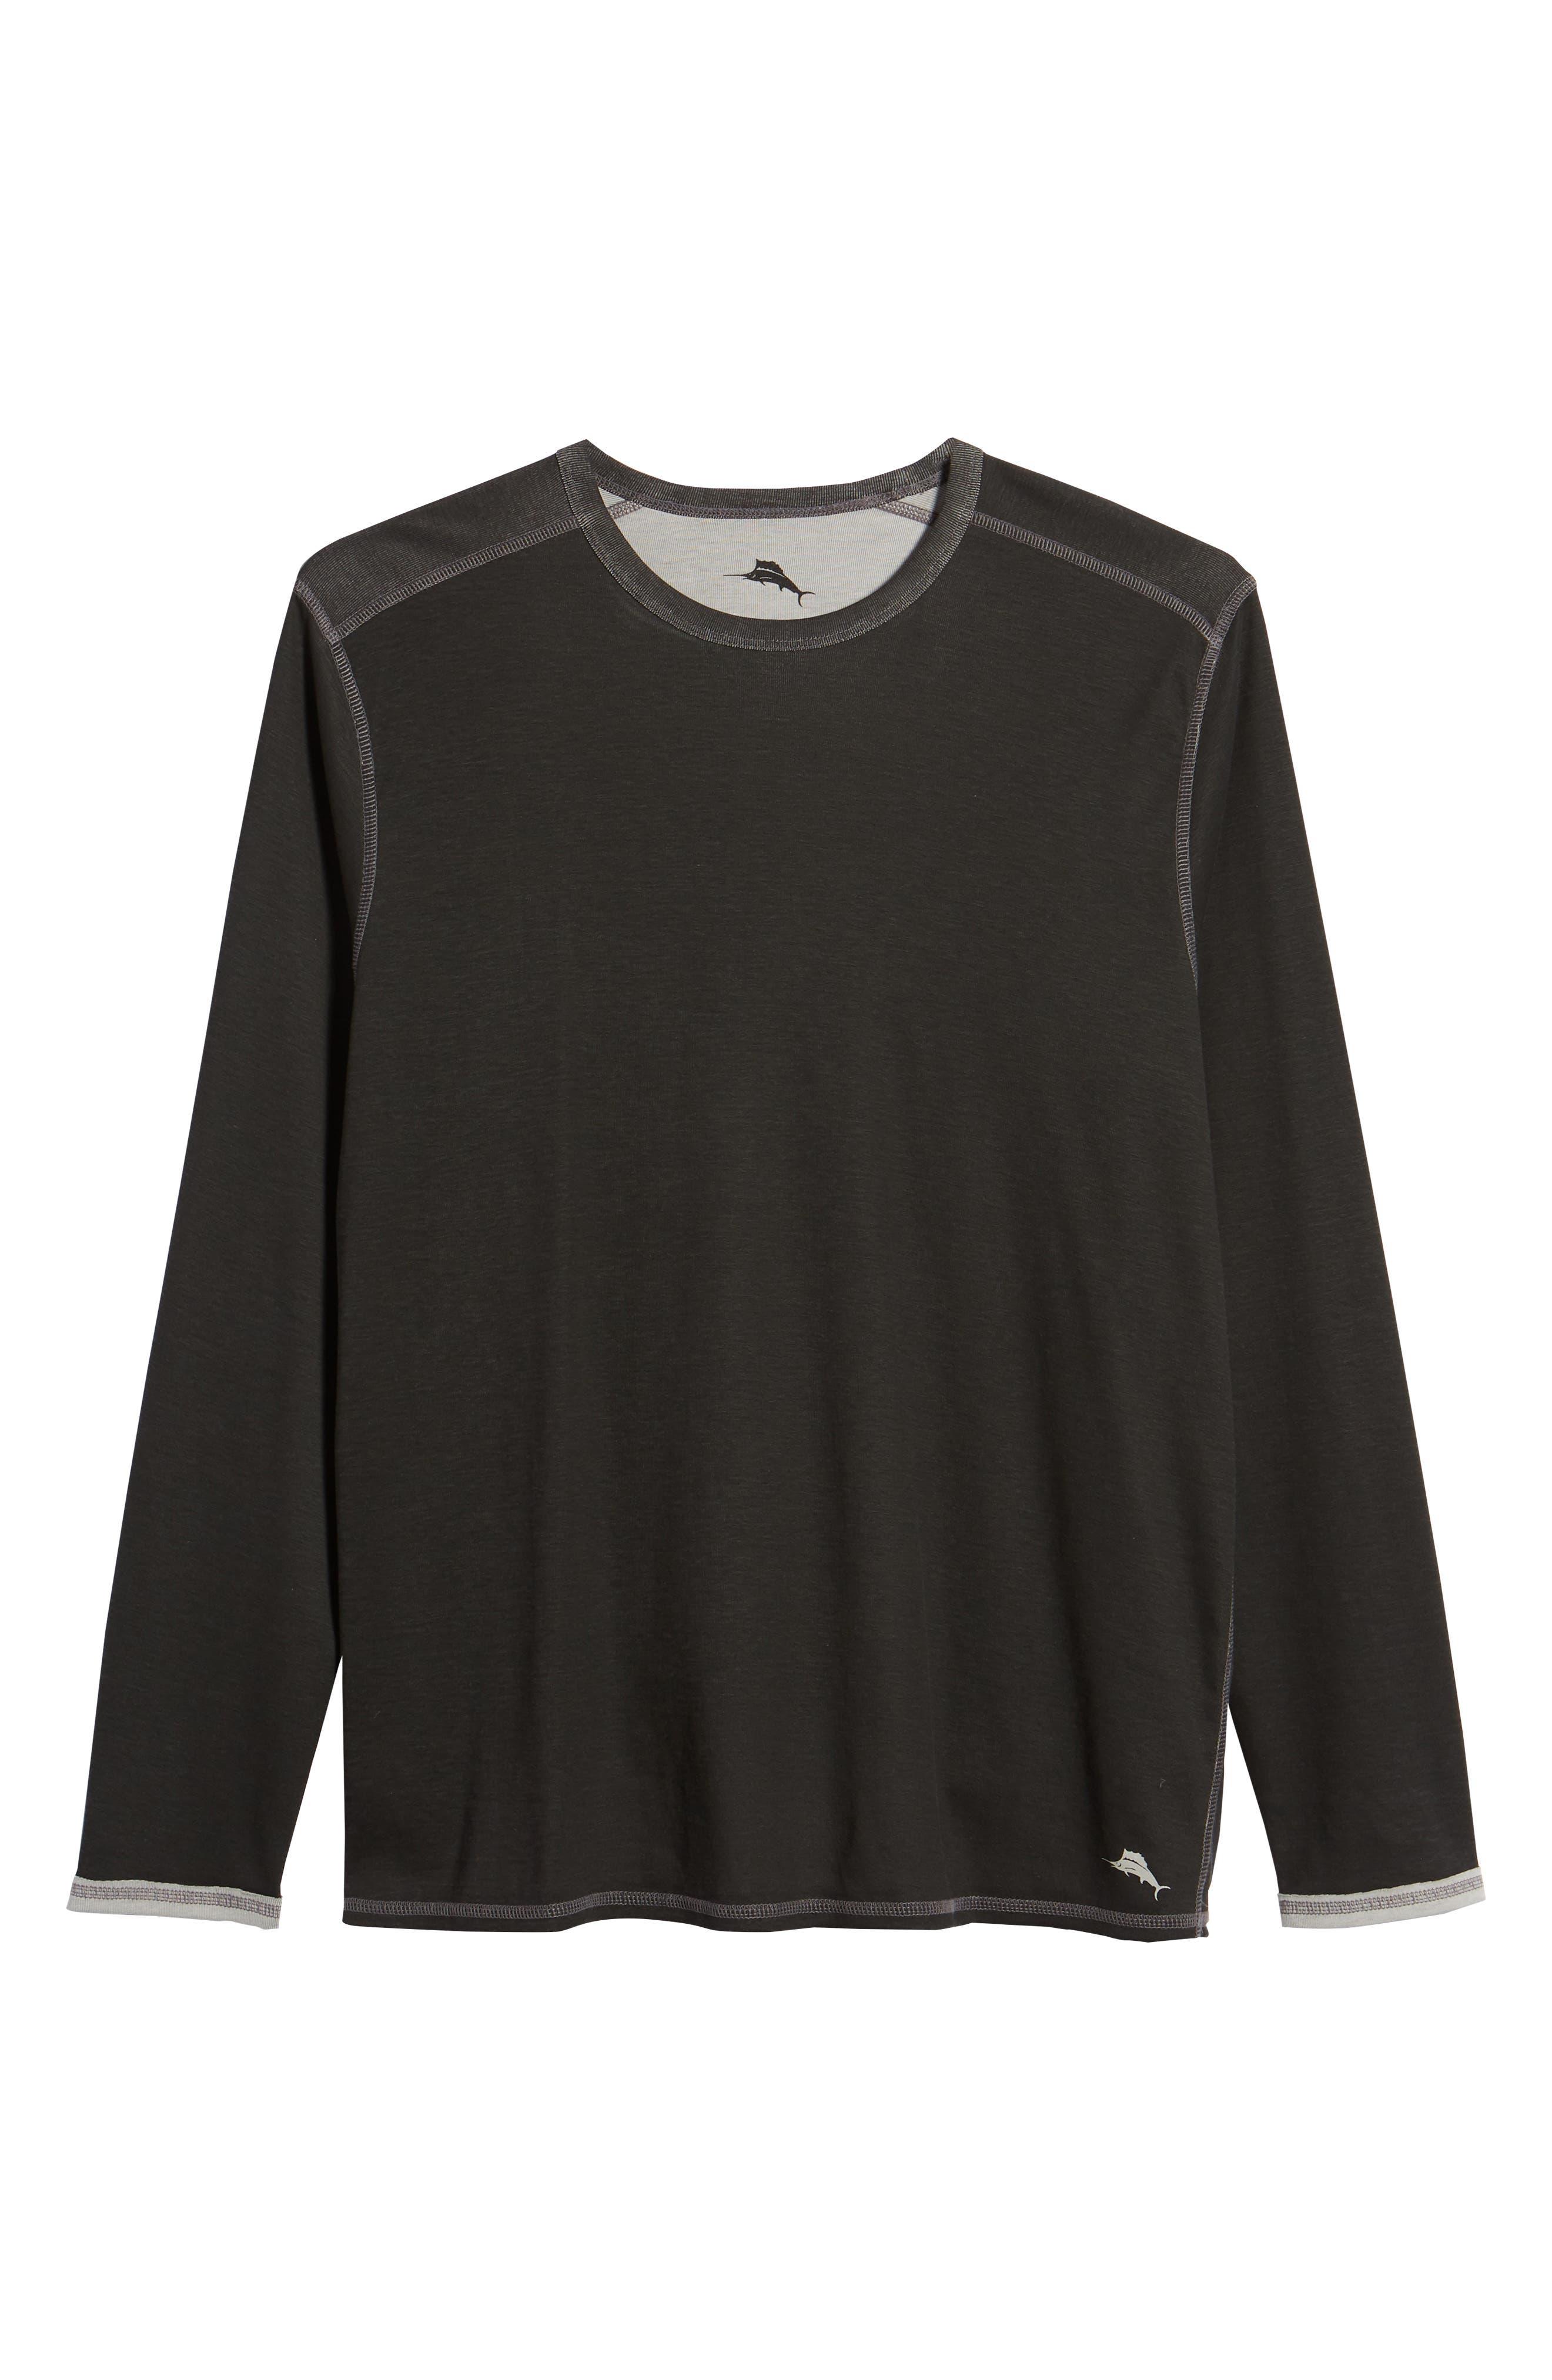 Dual in the Sun Reversible T-Shirt,                             Alternate thumbnail 7, color,                             001